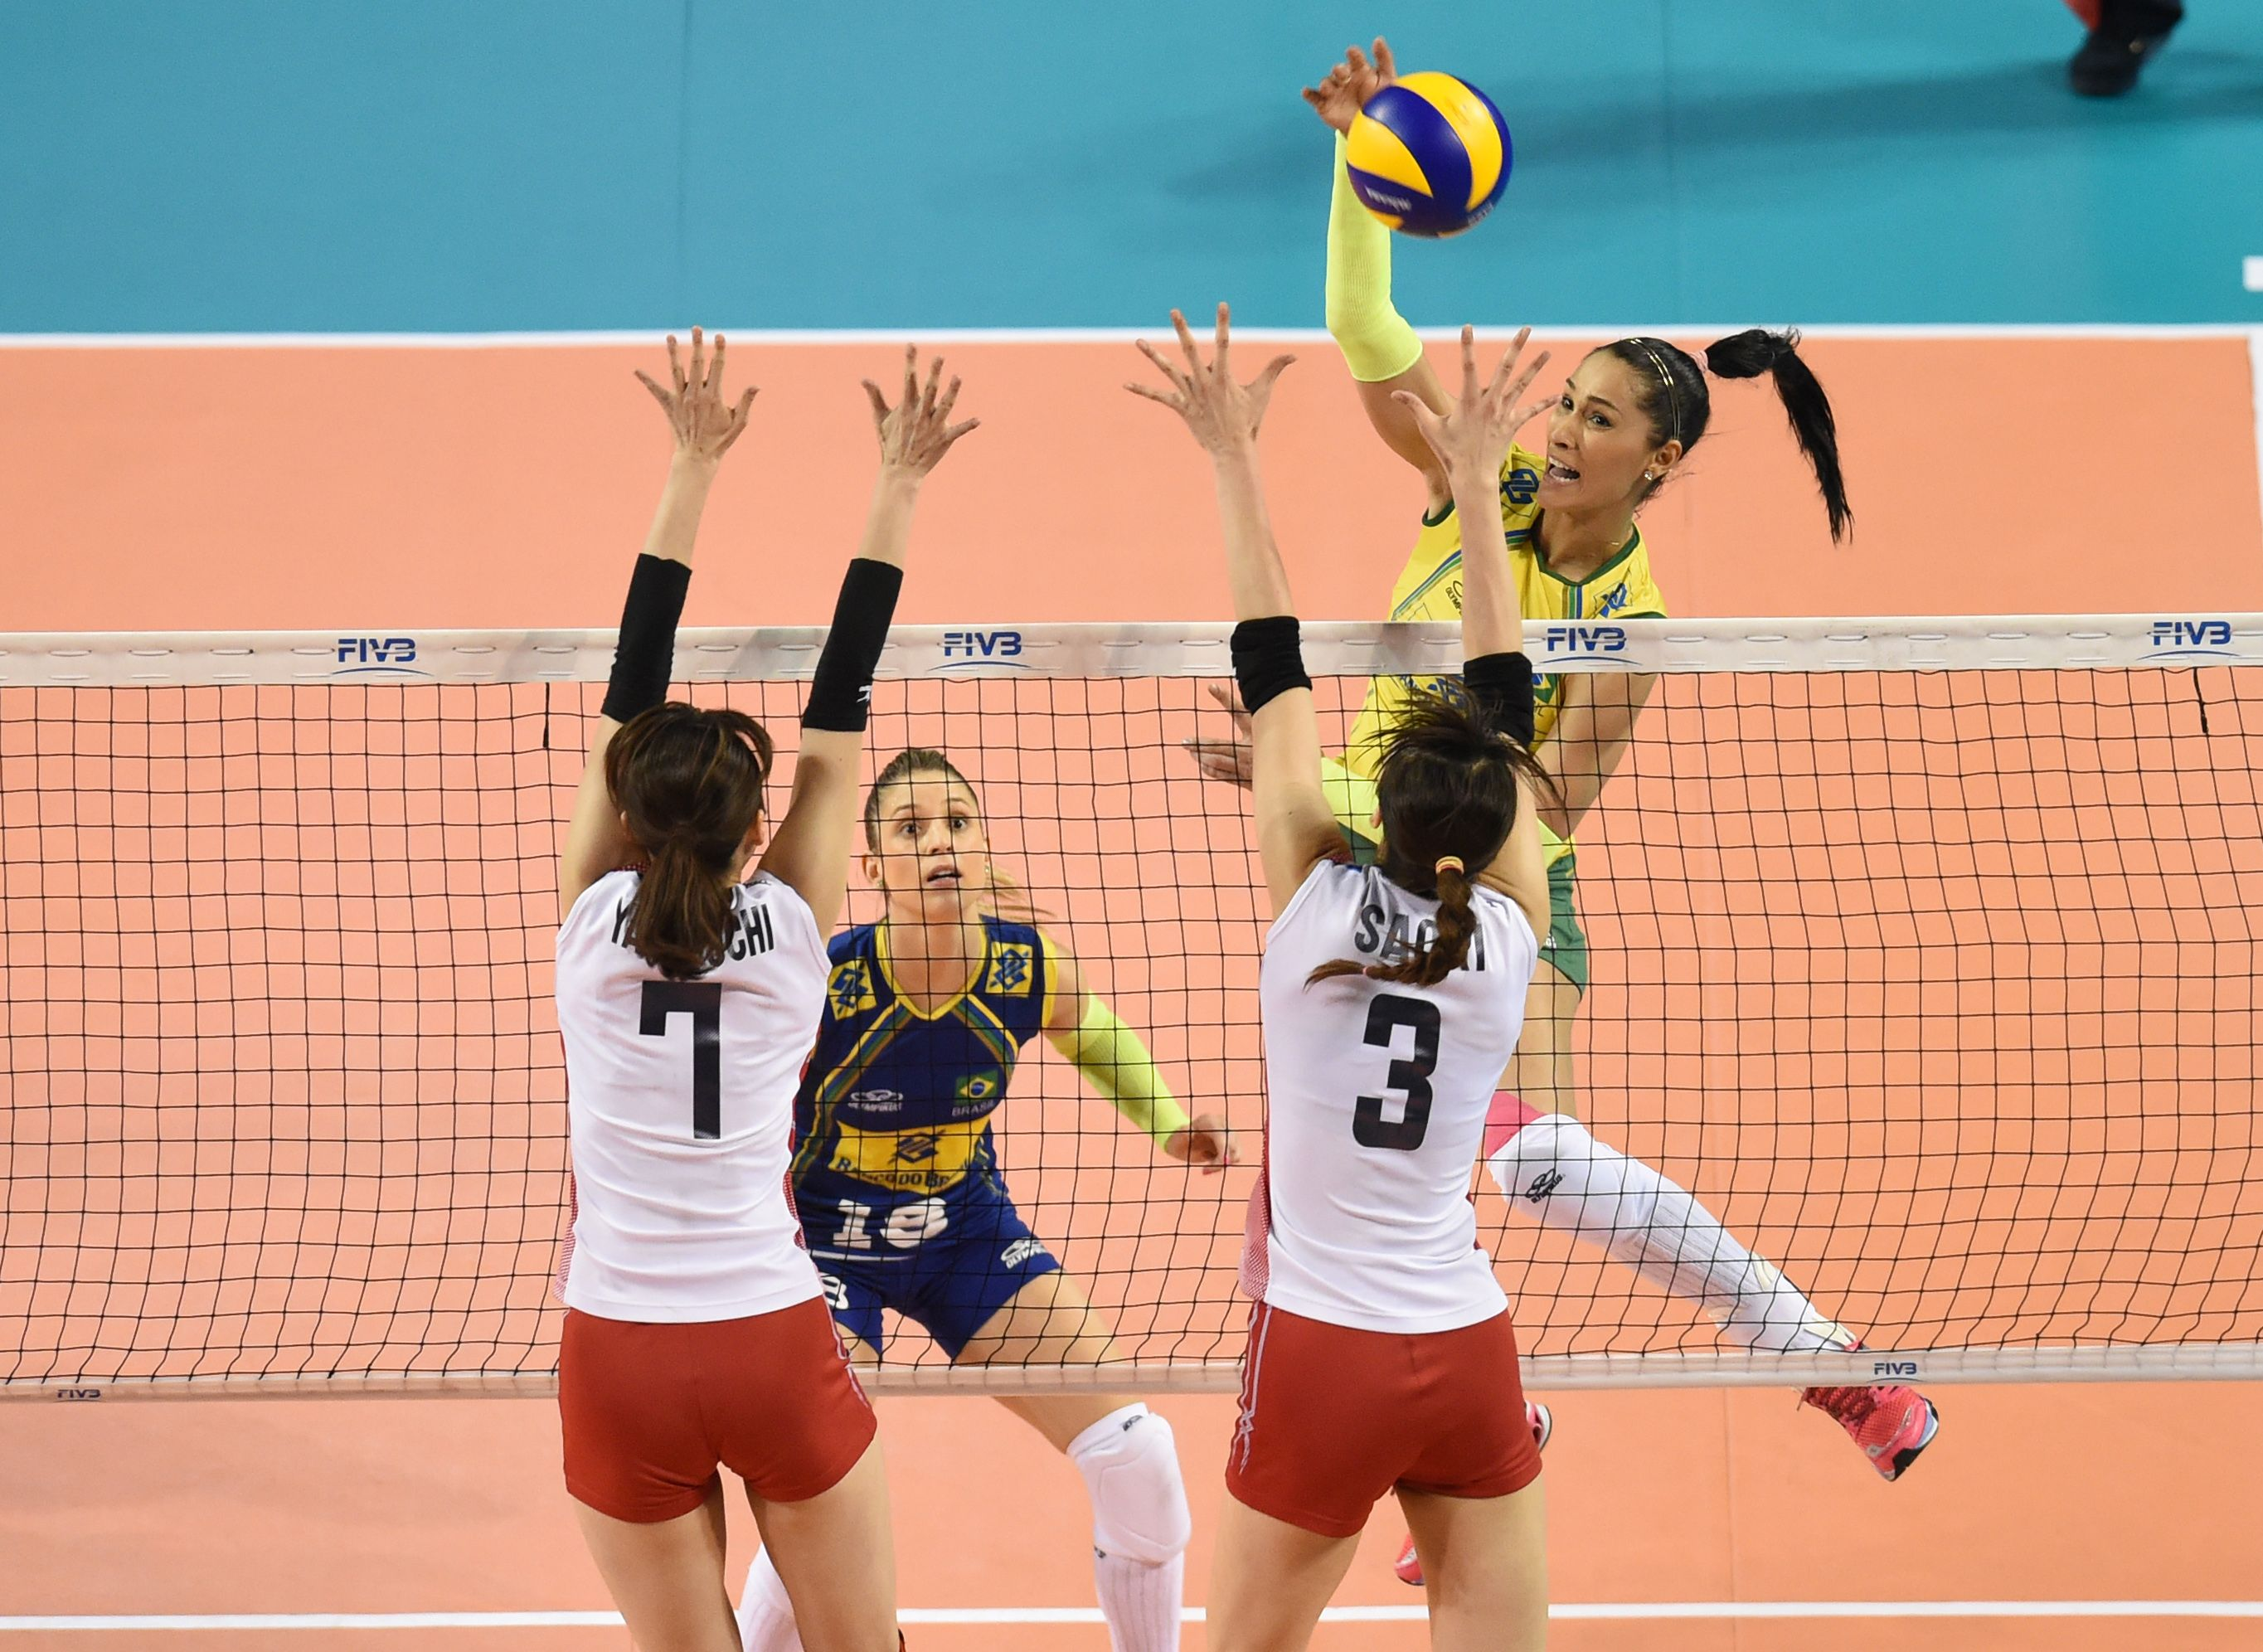 Jaqueline Pereira De Carvalho Endres Of Brazil Spikes The Ball Tall Women Pereira Ball